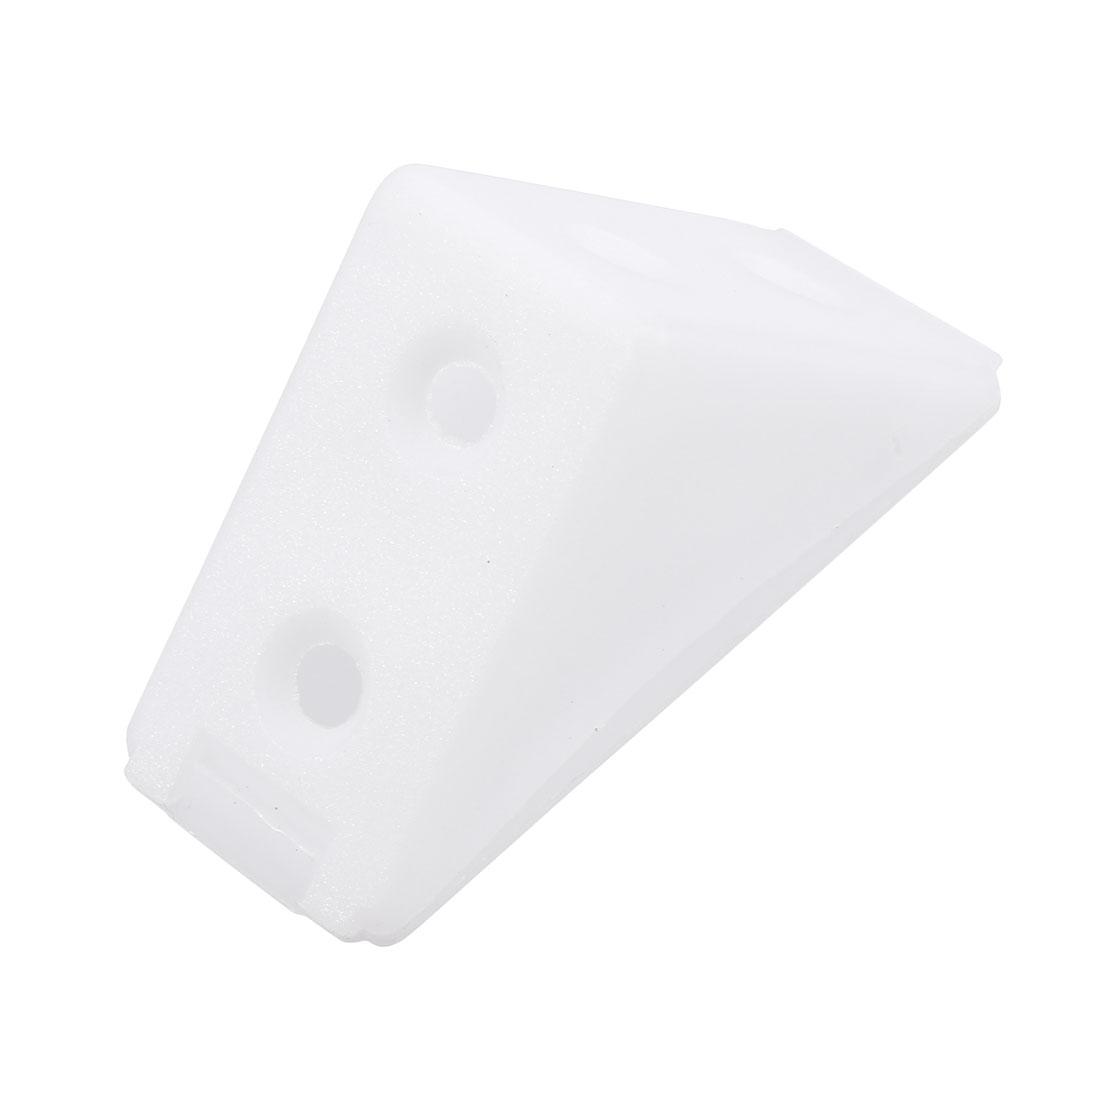 Shelf Cabinet Plastic Corner Braces 4 Holes Angle Brackets w Cover Cap, 30 Pcs